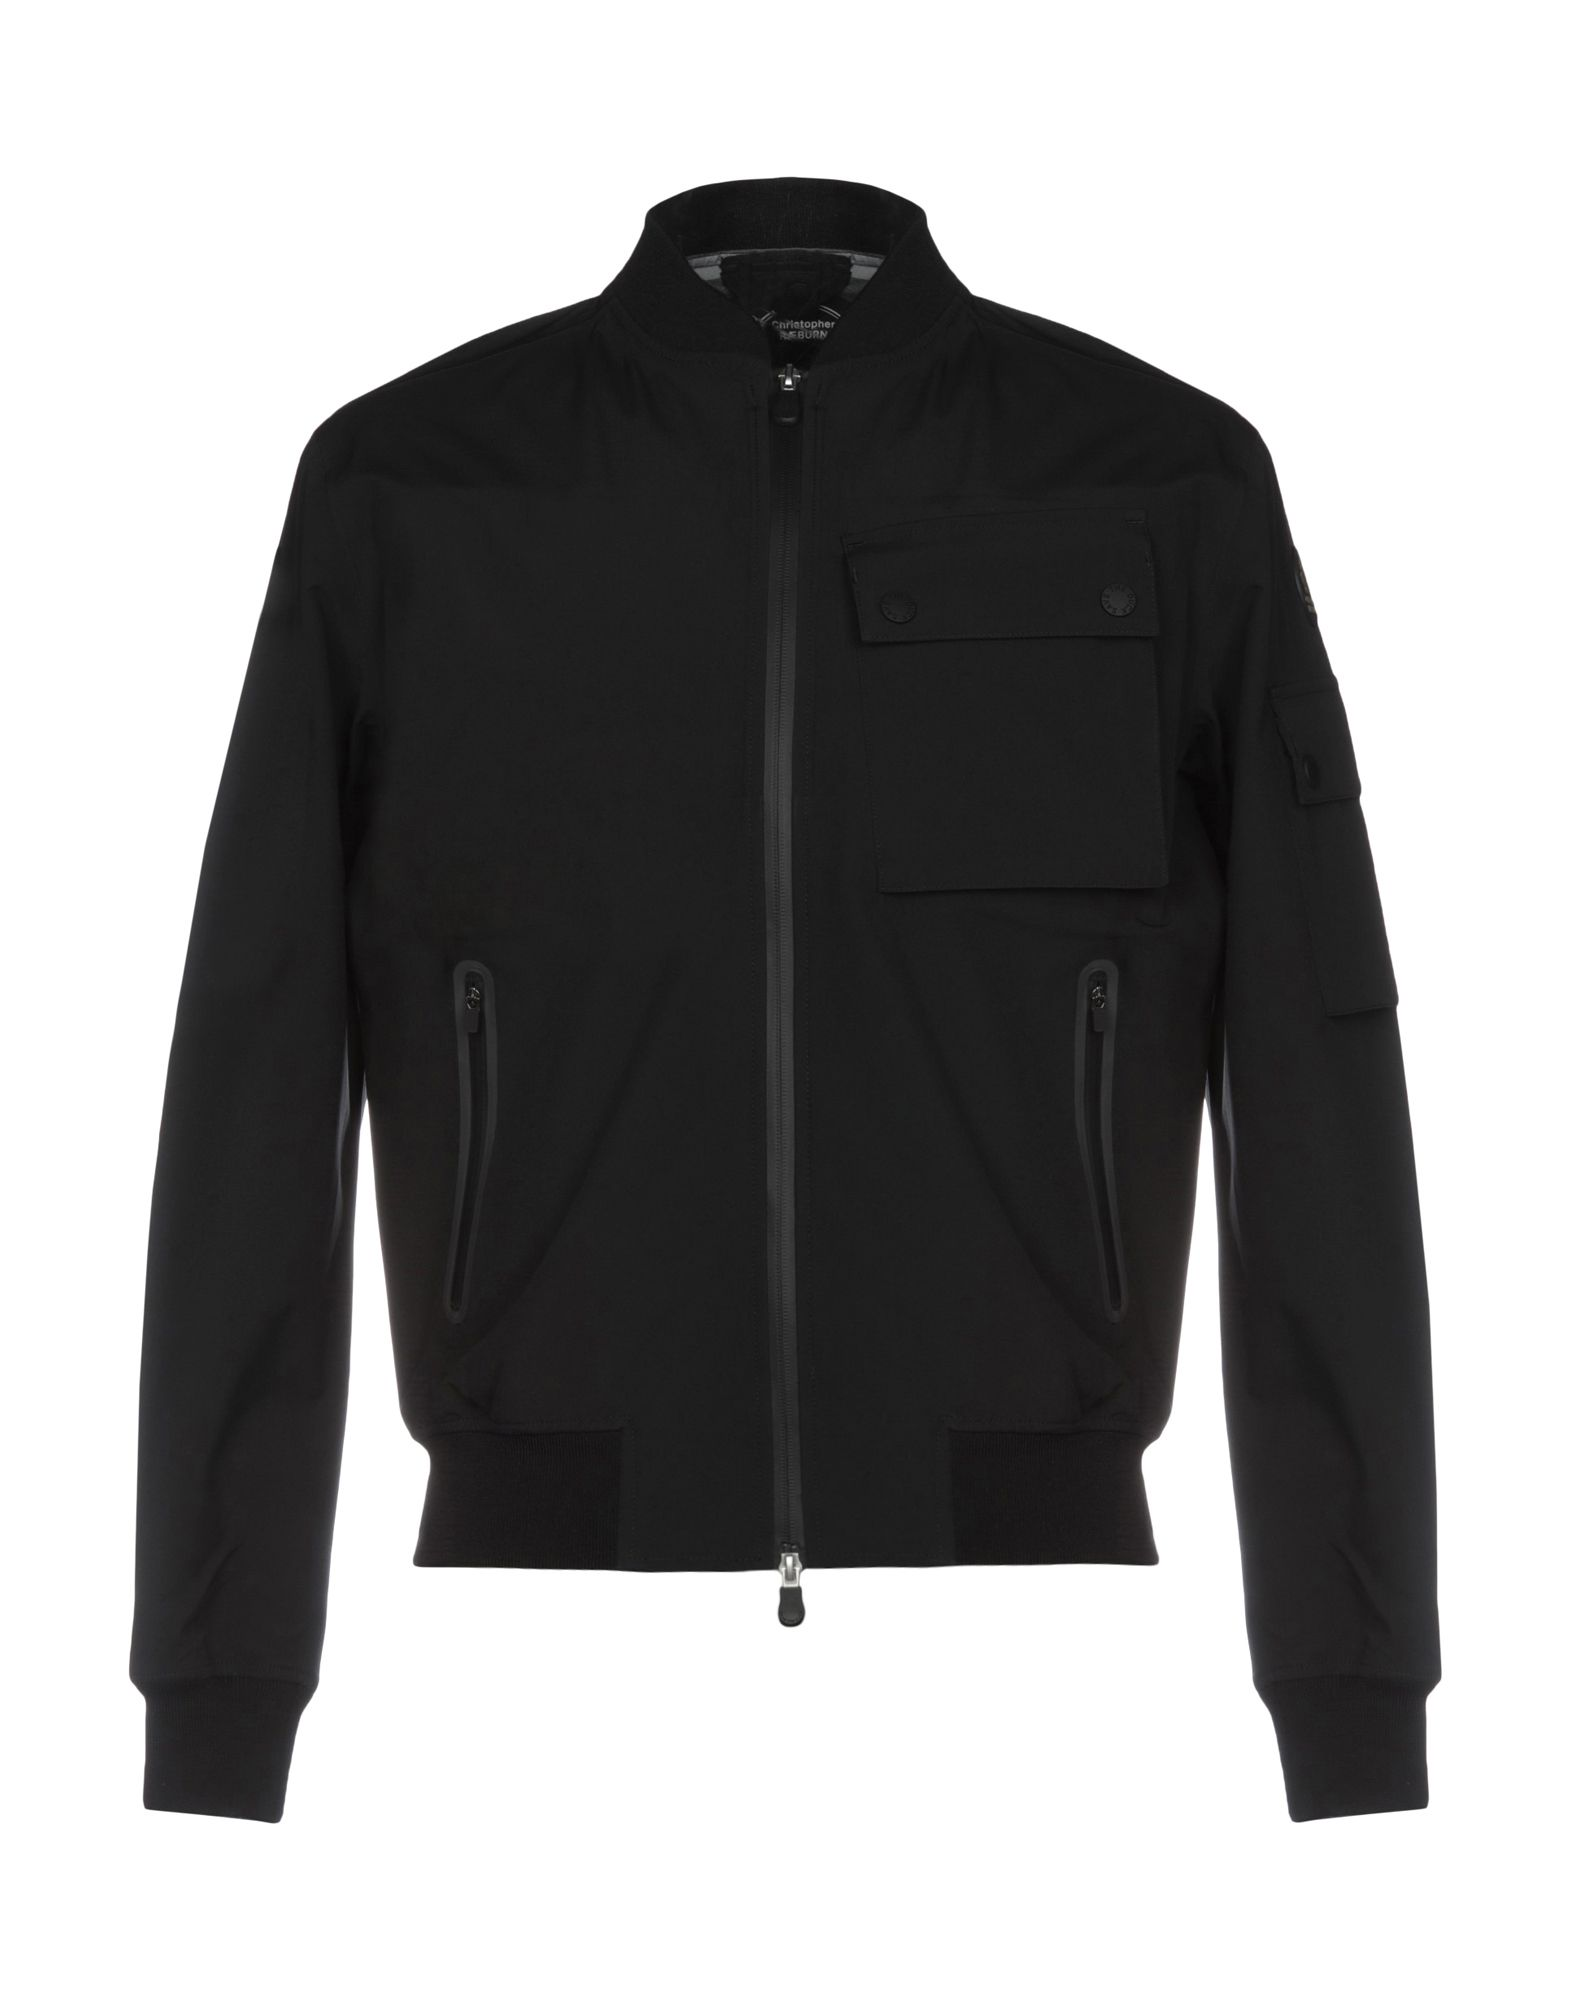 SAVE THE DUCK x CHRISTOPHER RAEBURN Куртка недорго, оригинальная цена